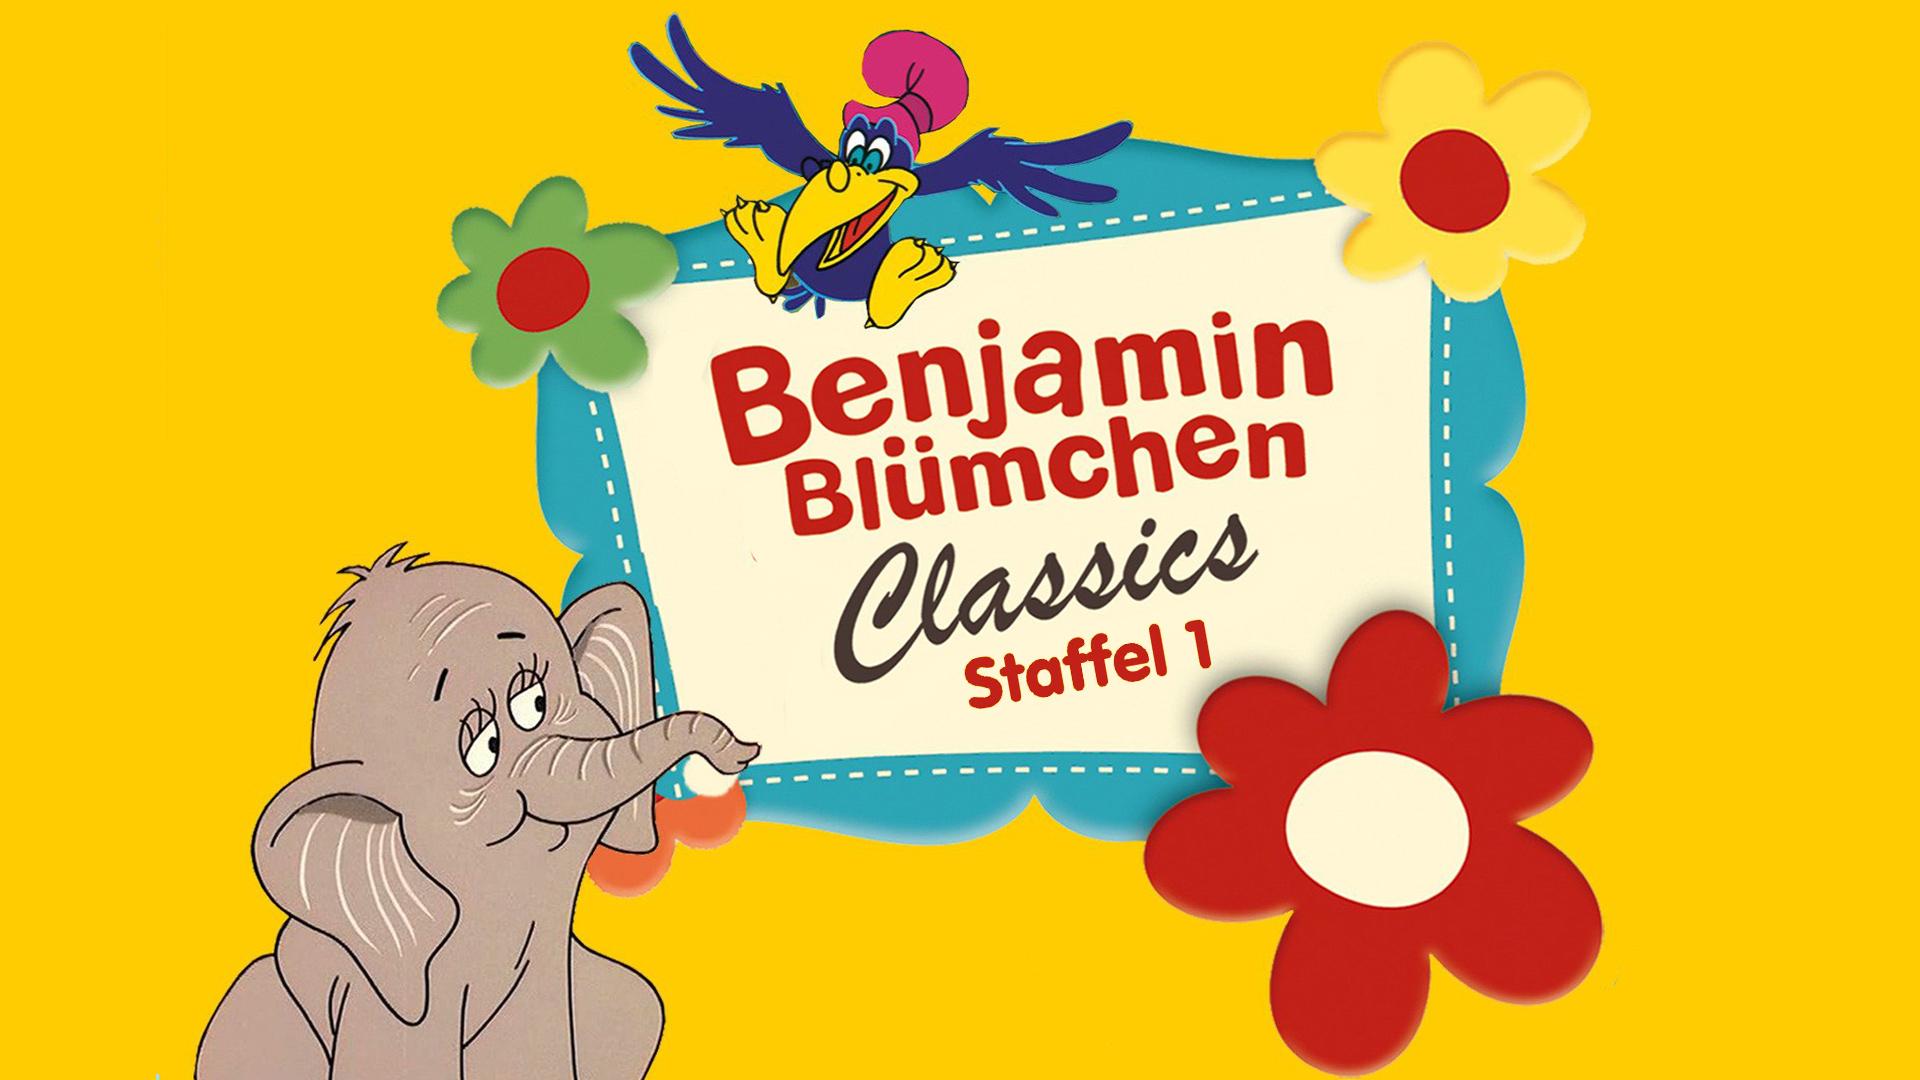 Benjamin Blümchen Classics - Staffel 1